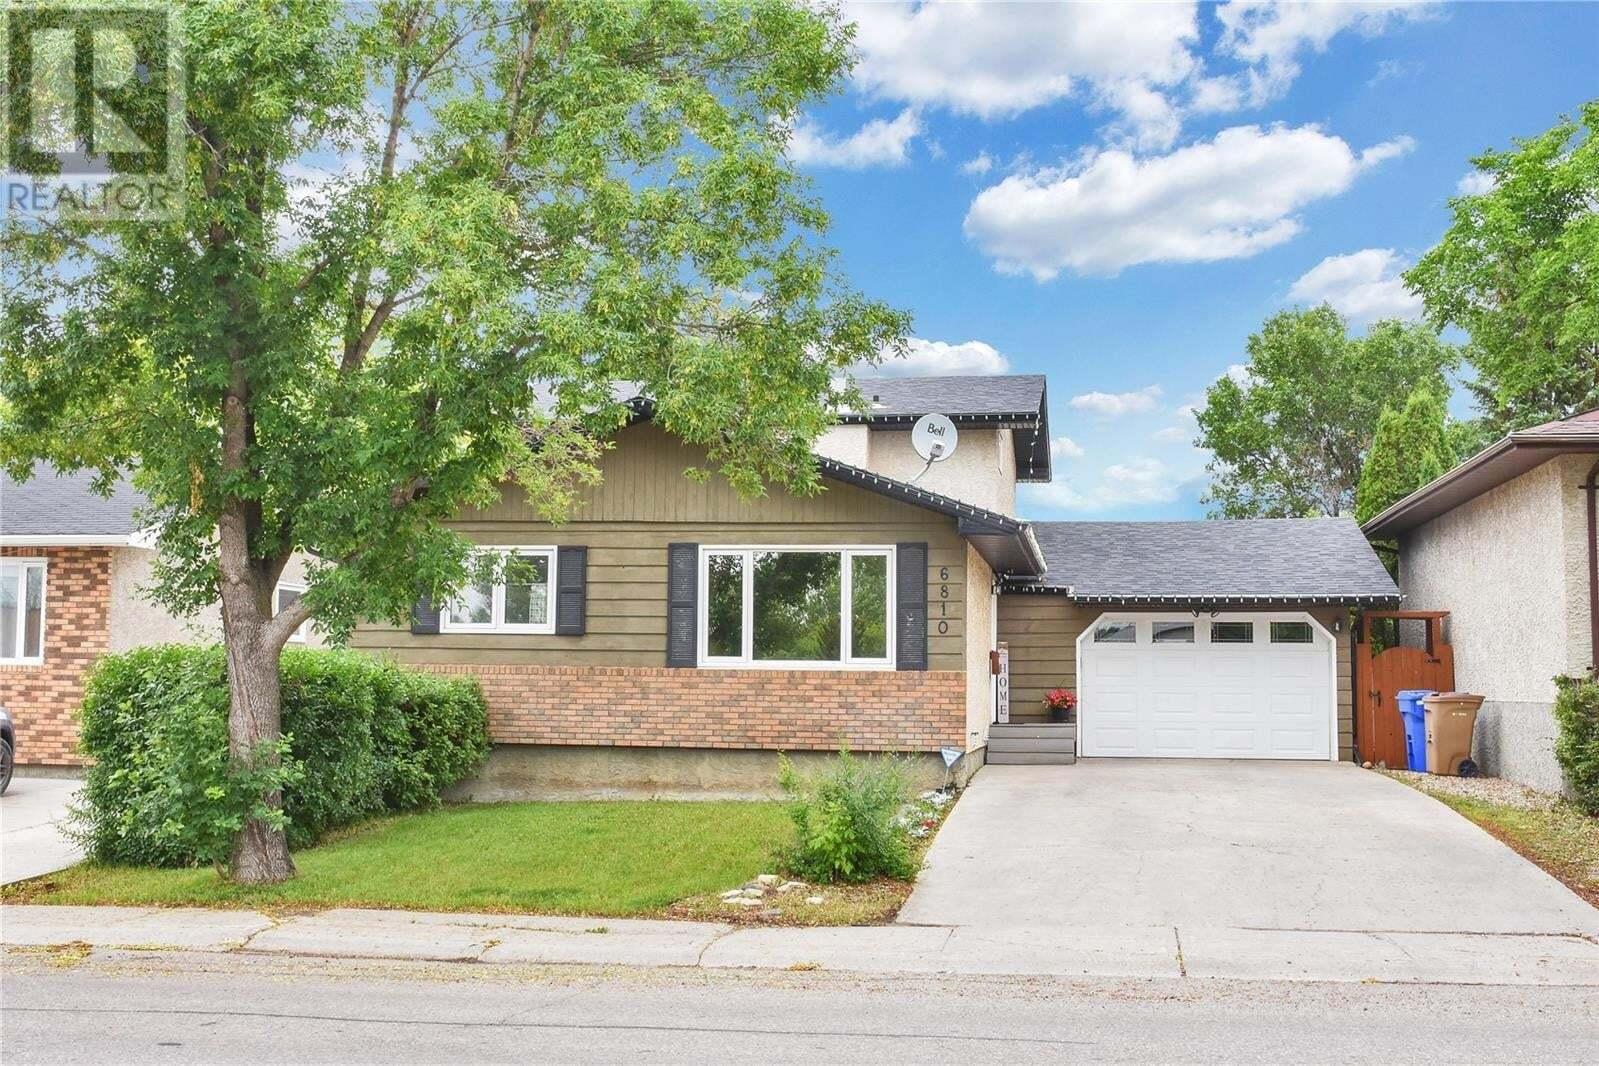 House for sale at 6810 Dalgliesh Dr Regina Saskatchewan - MLS: SK814836